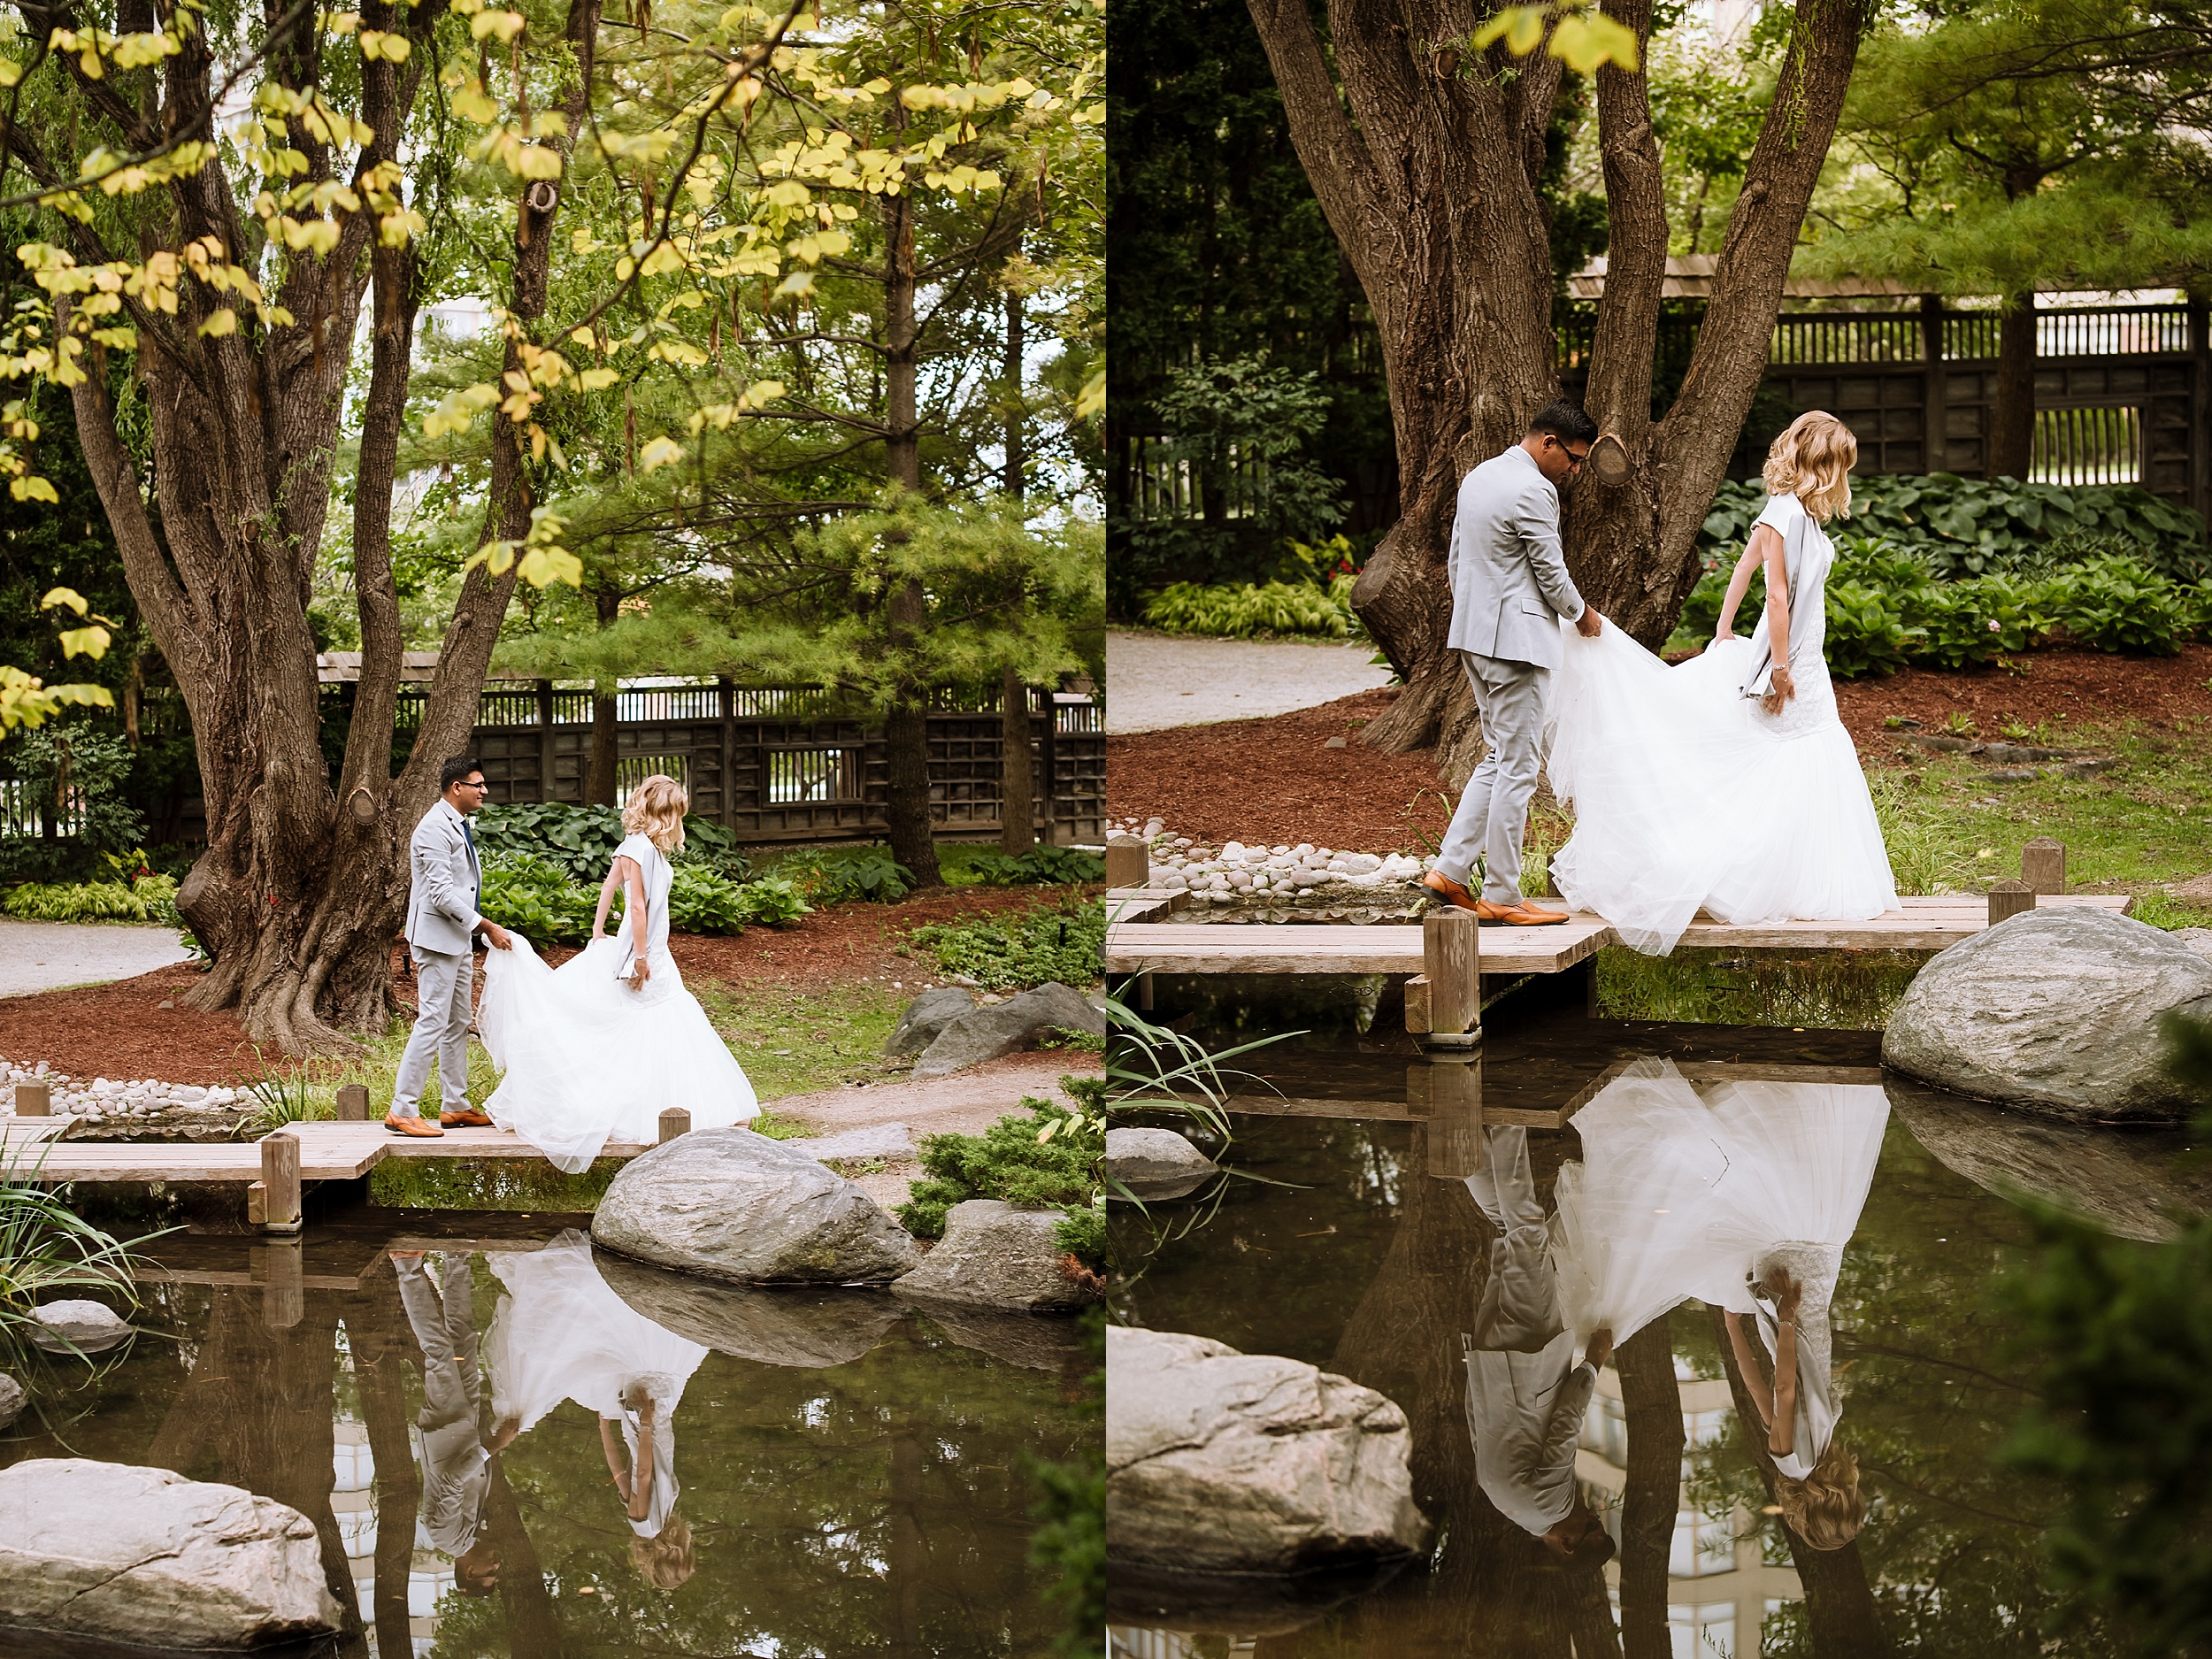 Kariya_Park_Wedding_Shoot_Toronto_Photographer_0030.jpg